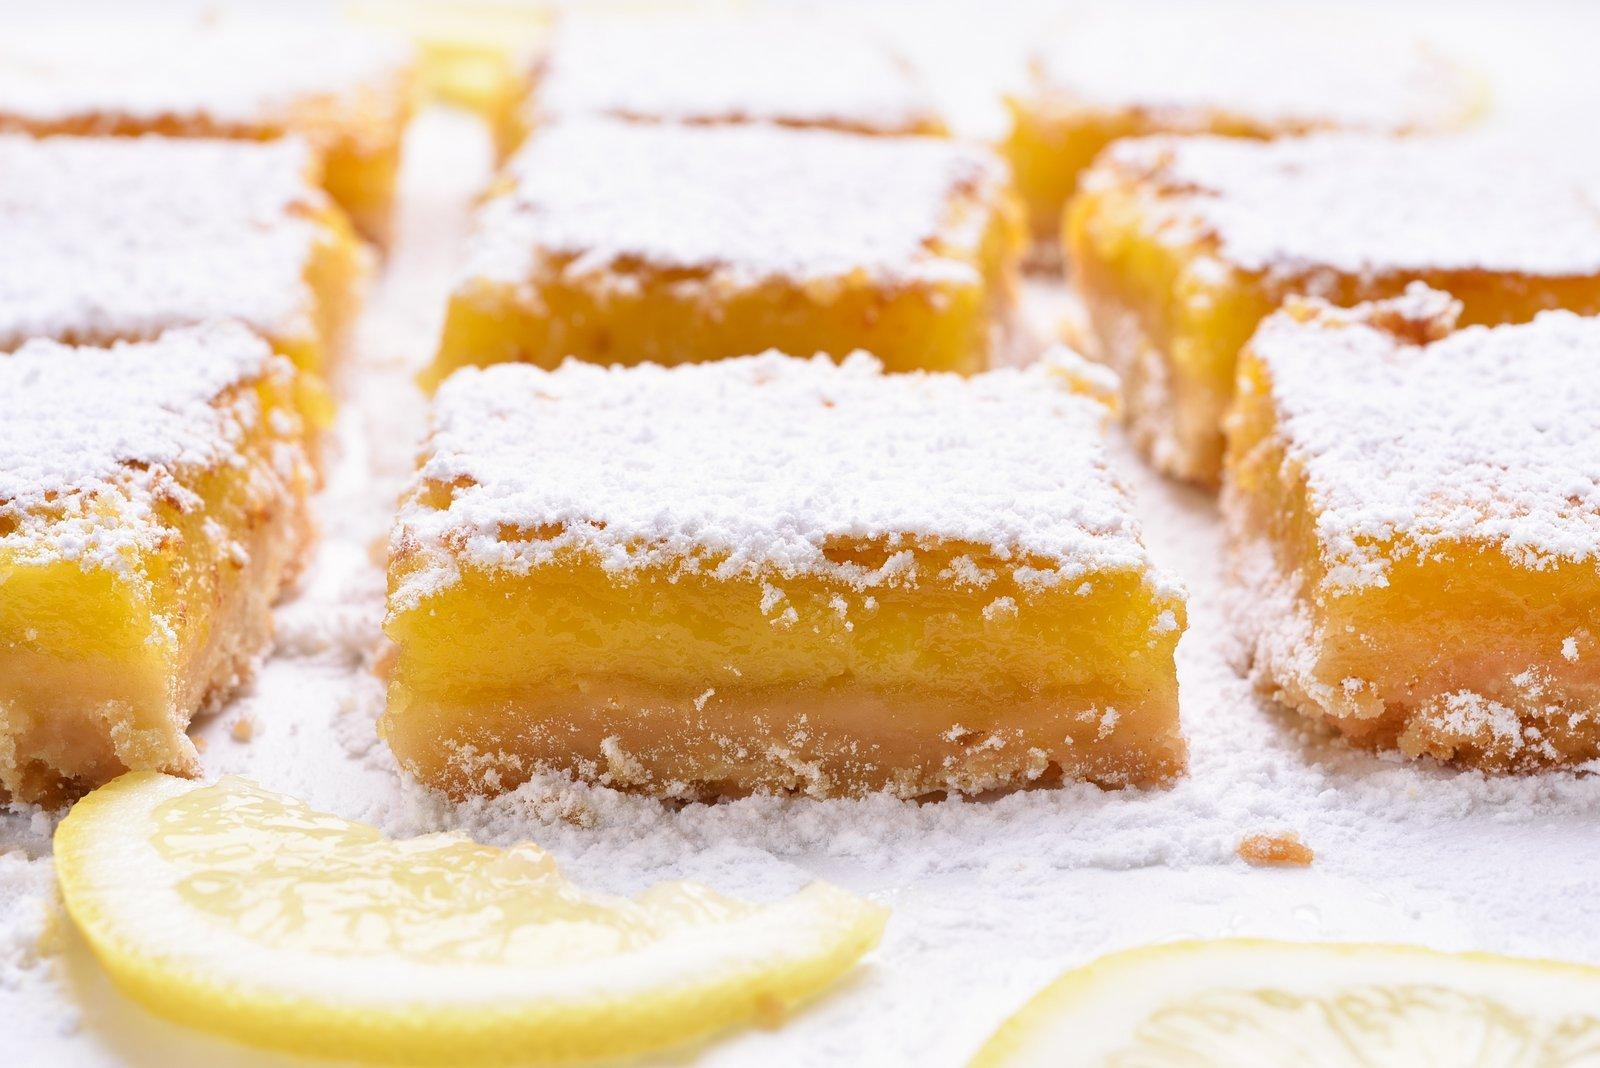 Classic lemon bar recipes 6 retro ways to make these delicious treats